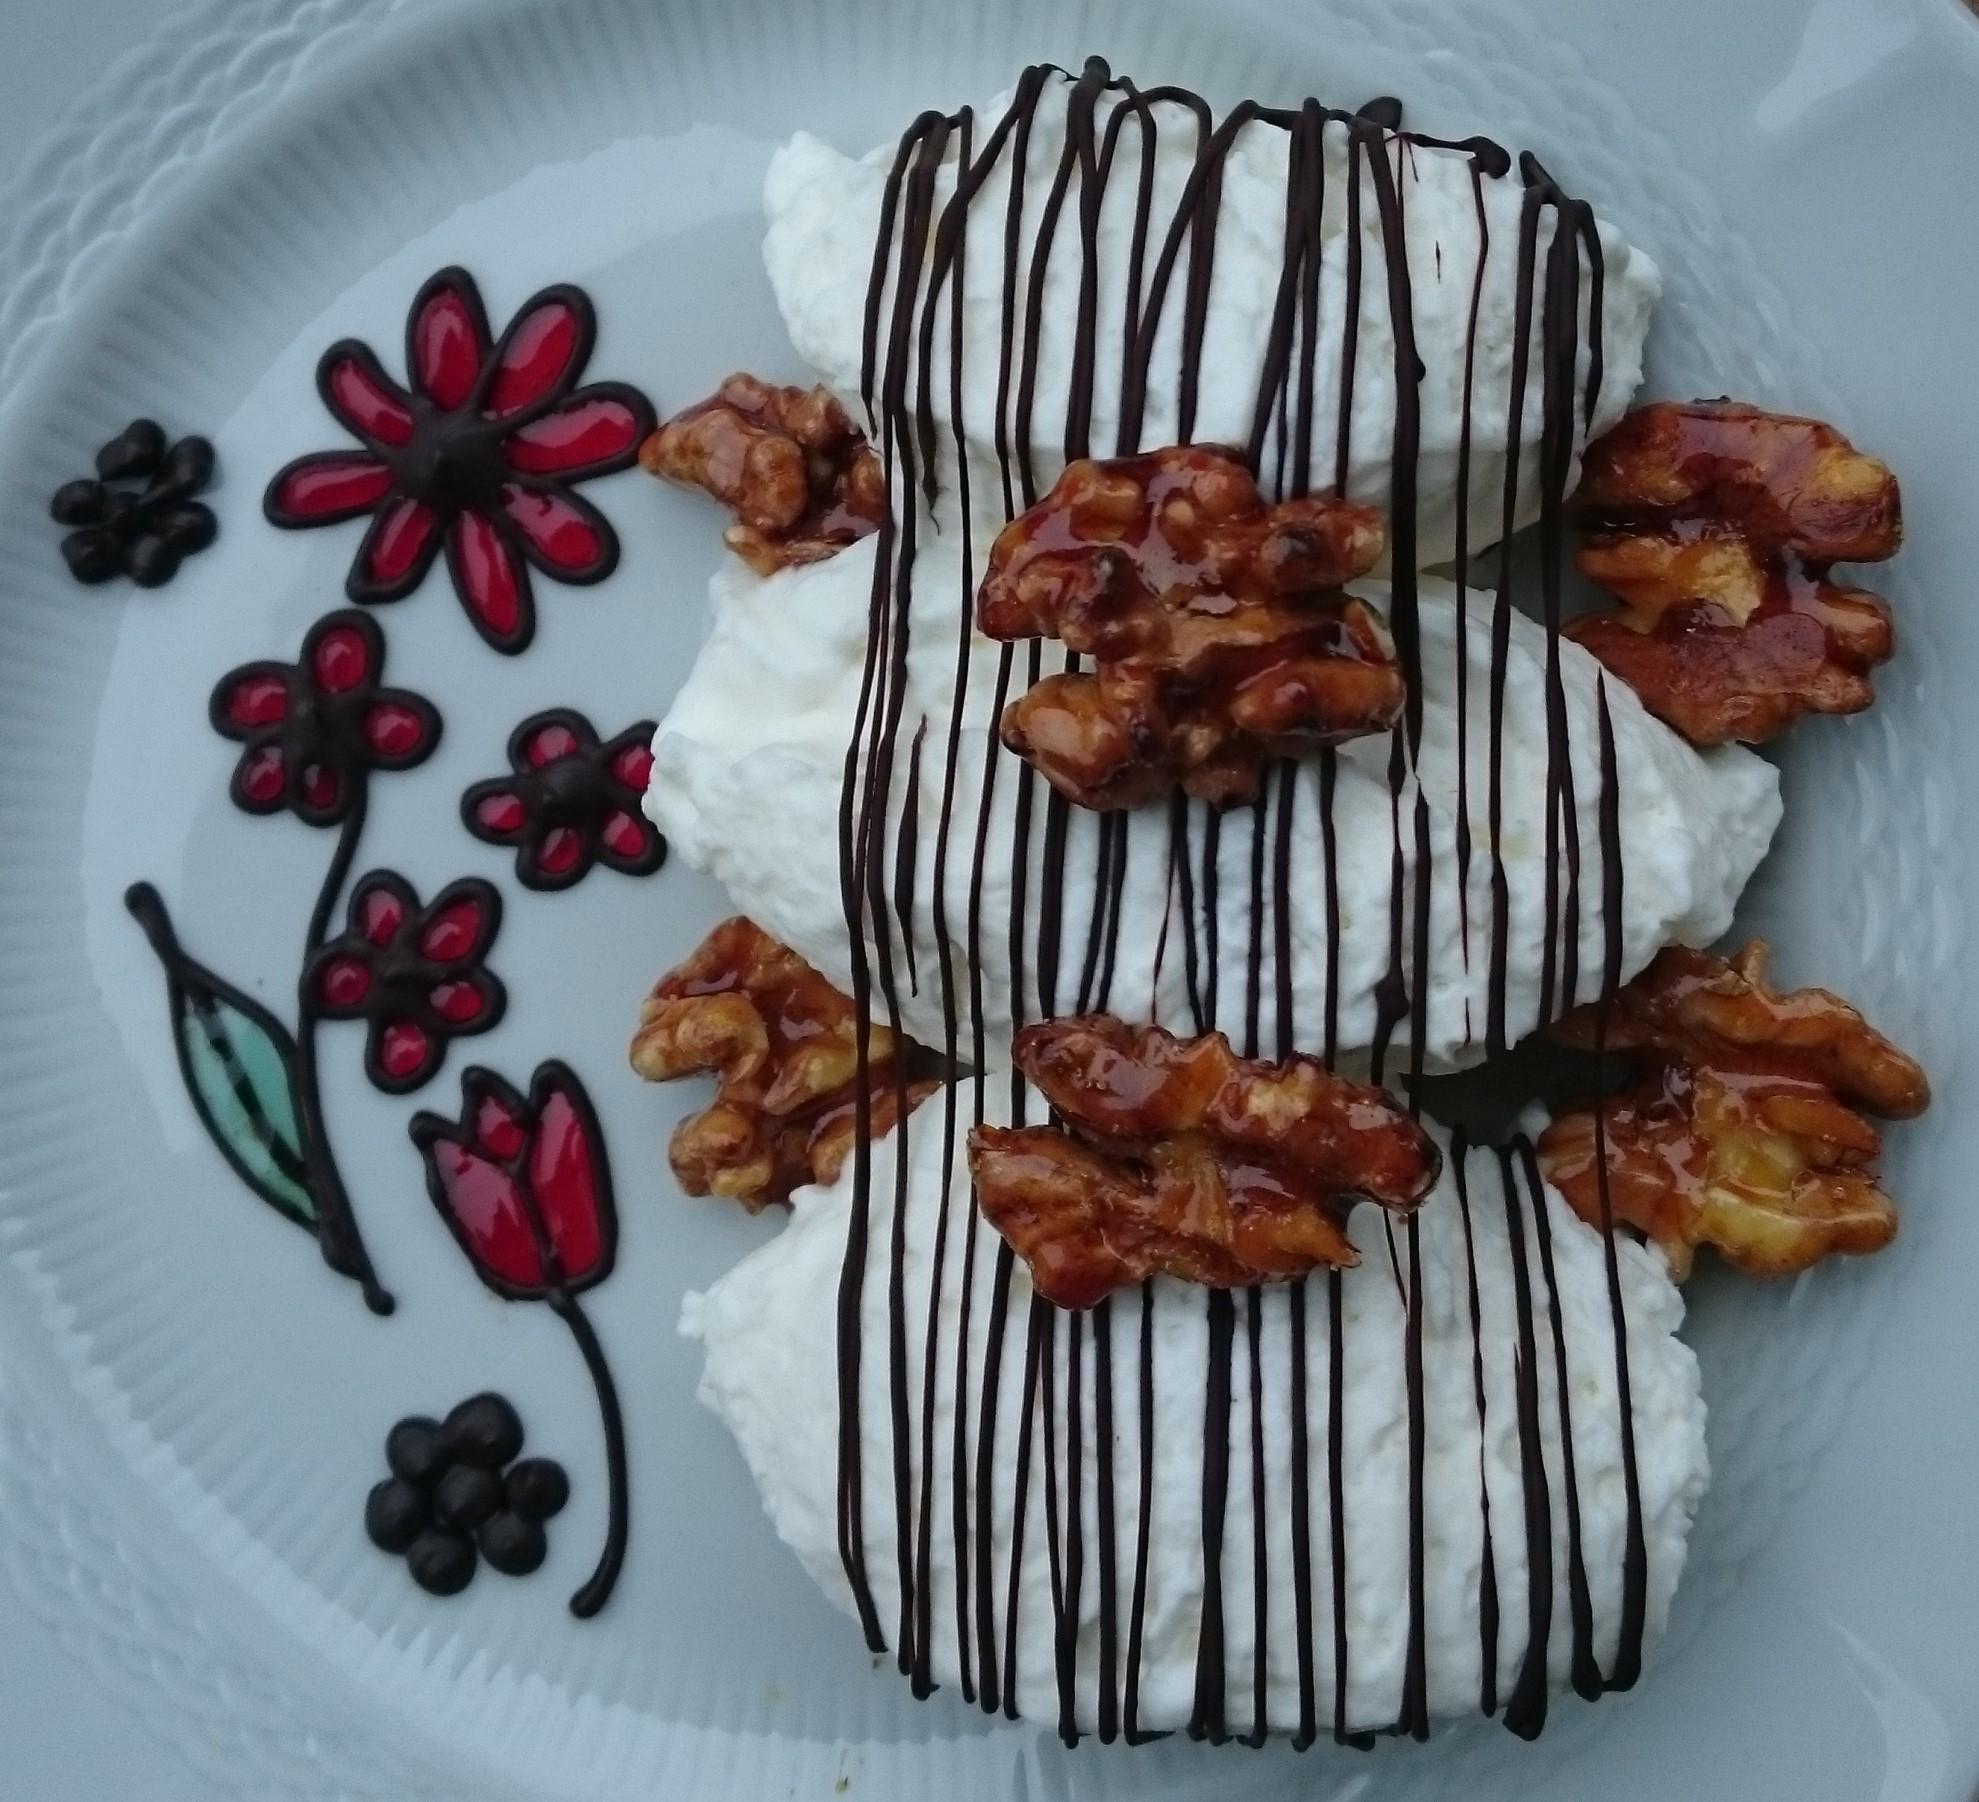 Nata con nueces caramelizadas